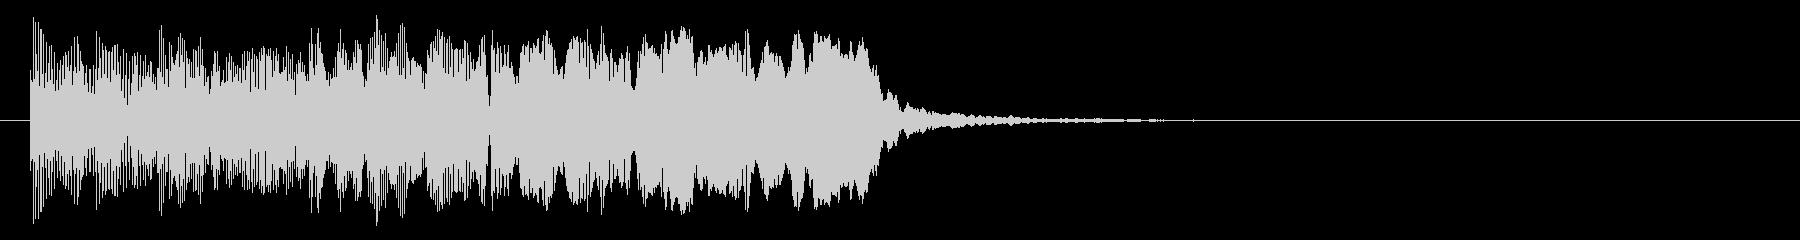 8bitパワーup-01-2_revの未再生の波形